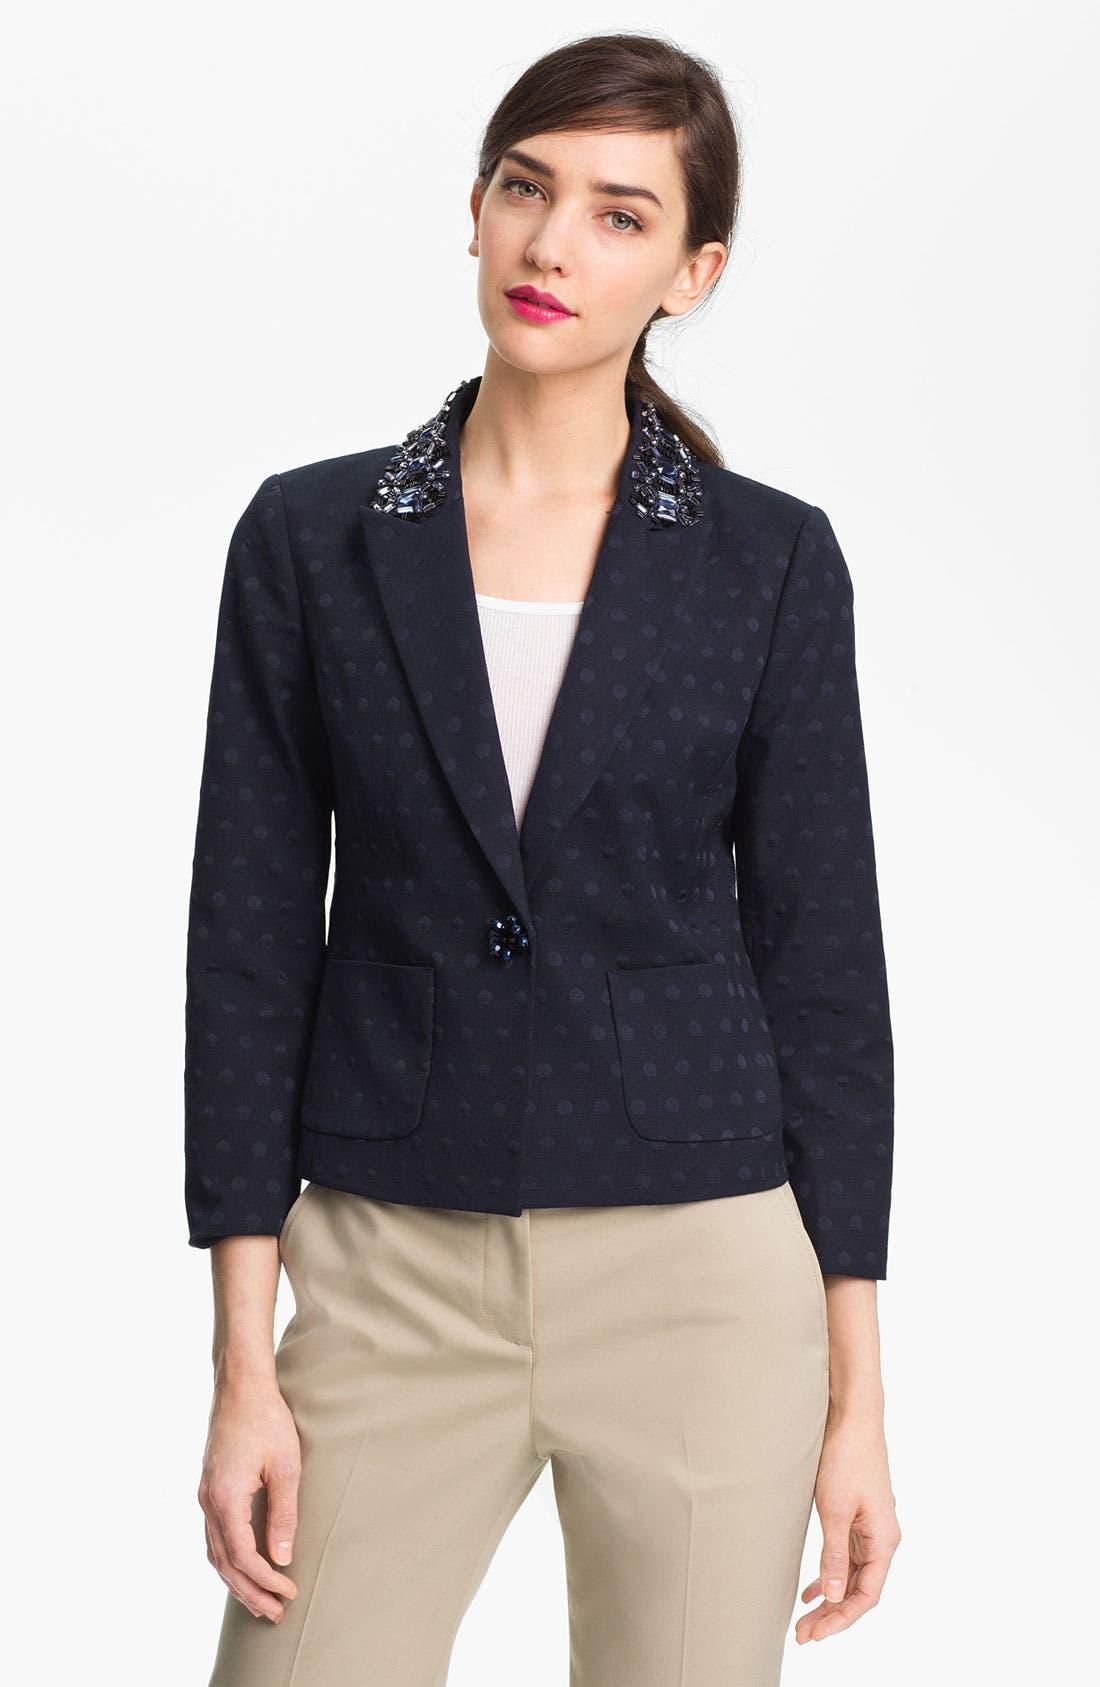 Alternate Image 1 Selected - Tory Burch 'Jaclyn' Embellished Blazer